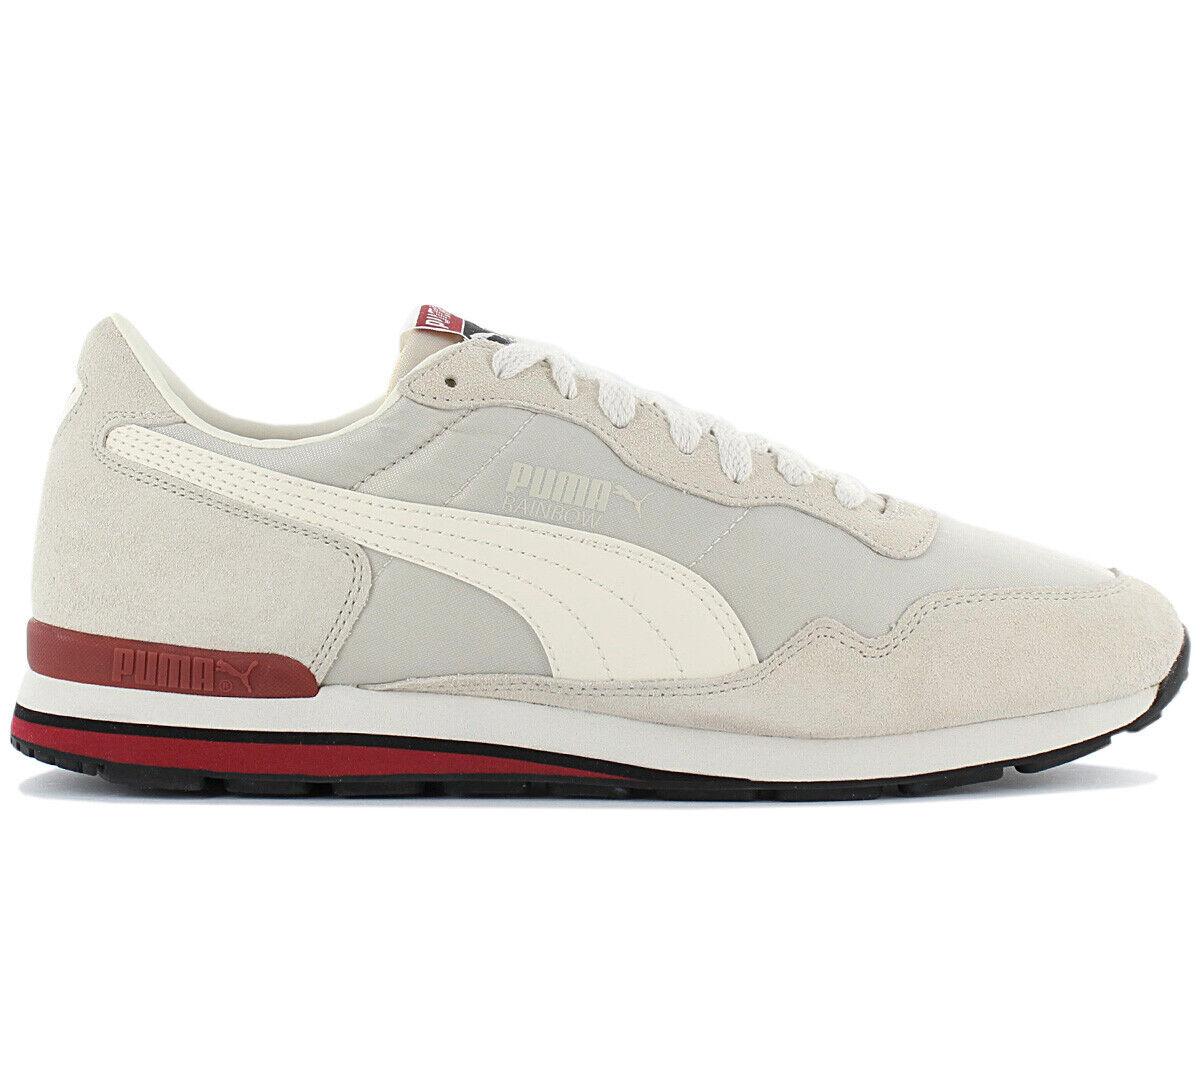 Puma Classic Rainbow SC MENS TRAINERS 365583-02 White Beige Retro shoes New